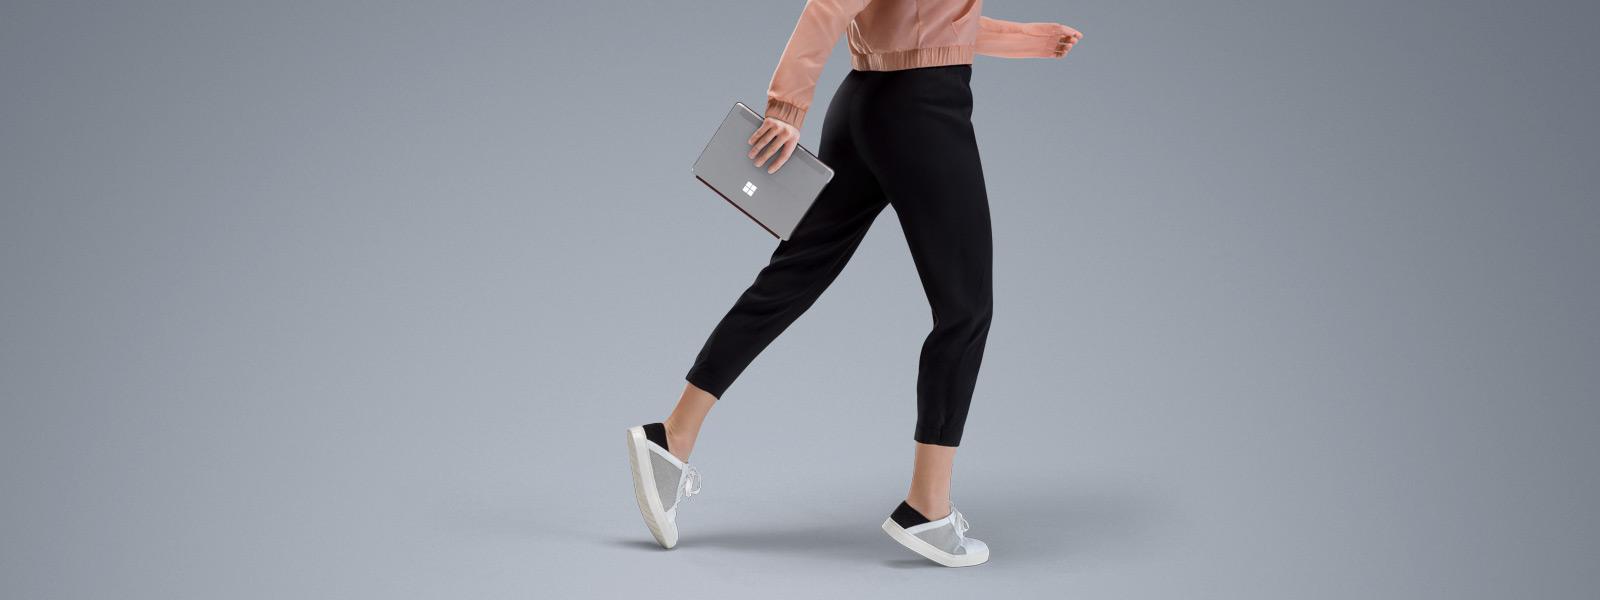 Una ragazza cammina portando un dispositivo Surface Go